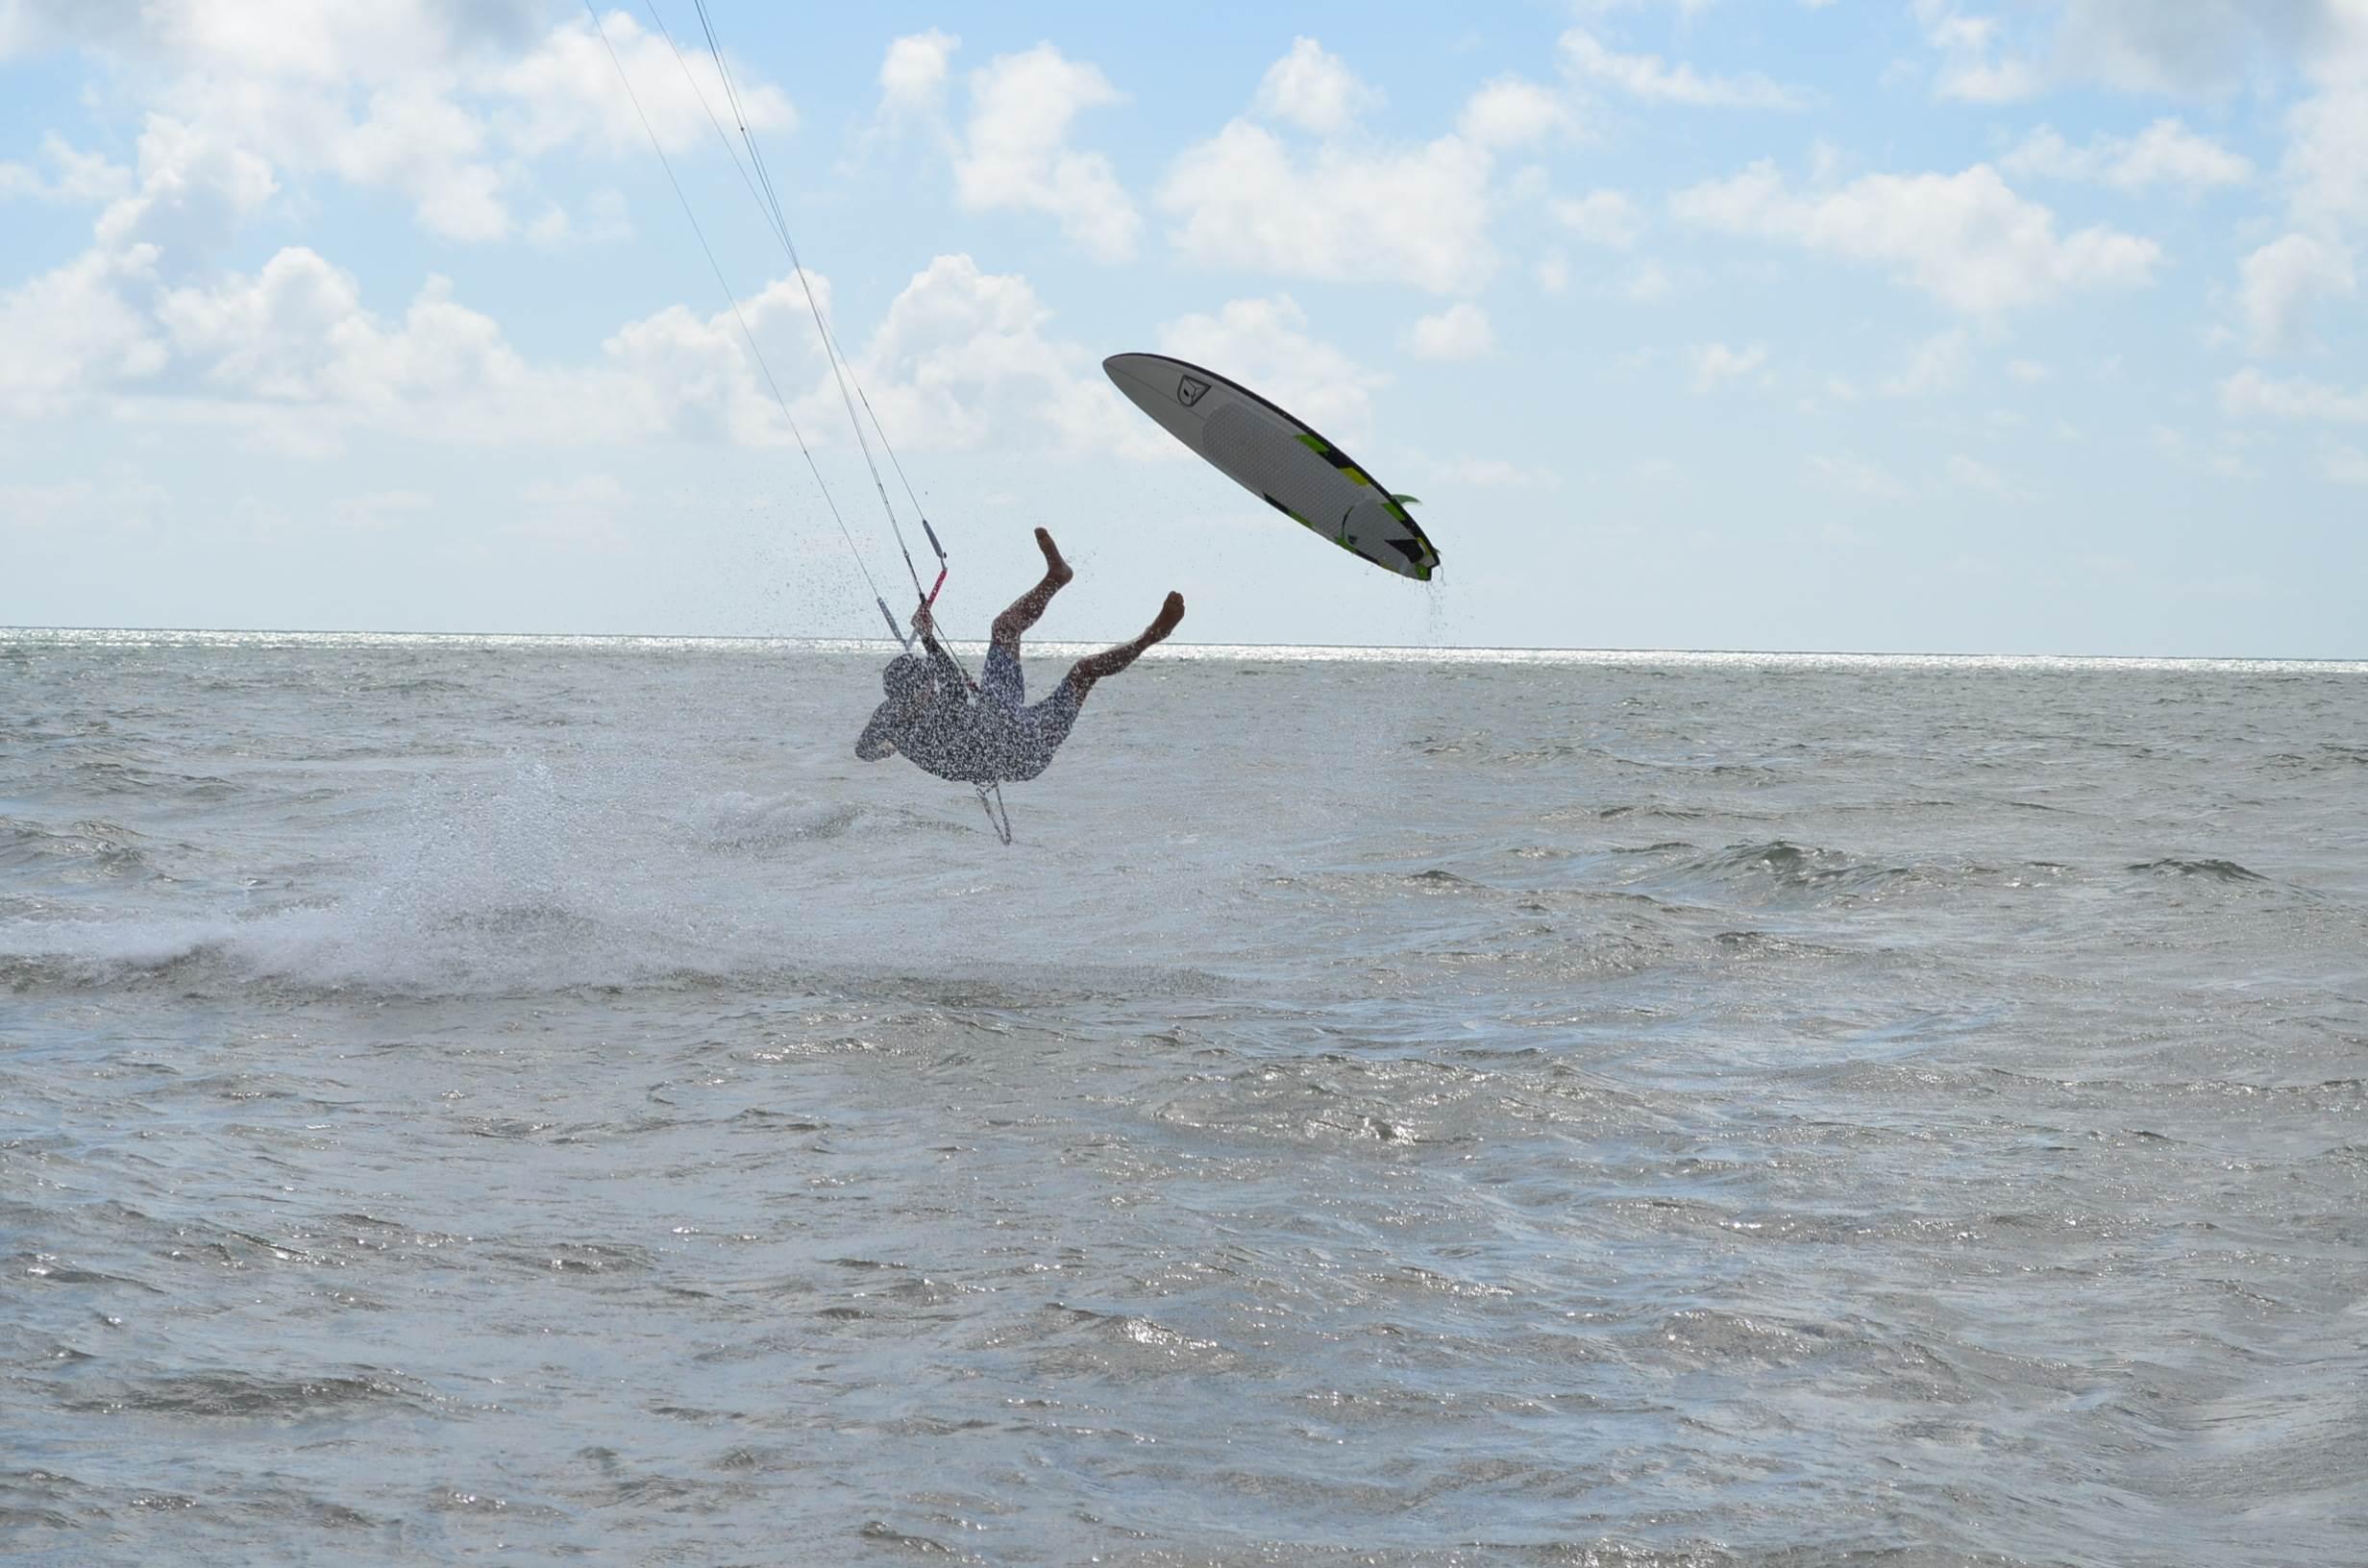 australian kite surfari pics and info kitesurfing forums. Black Bedroom Furniture Sets. Home Design Ideas